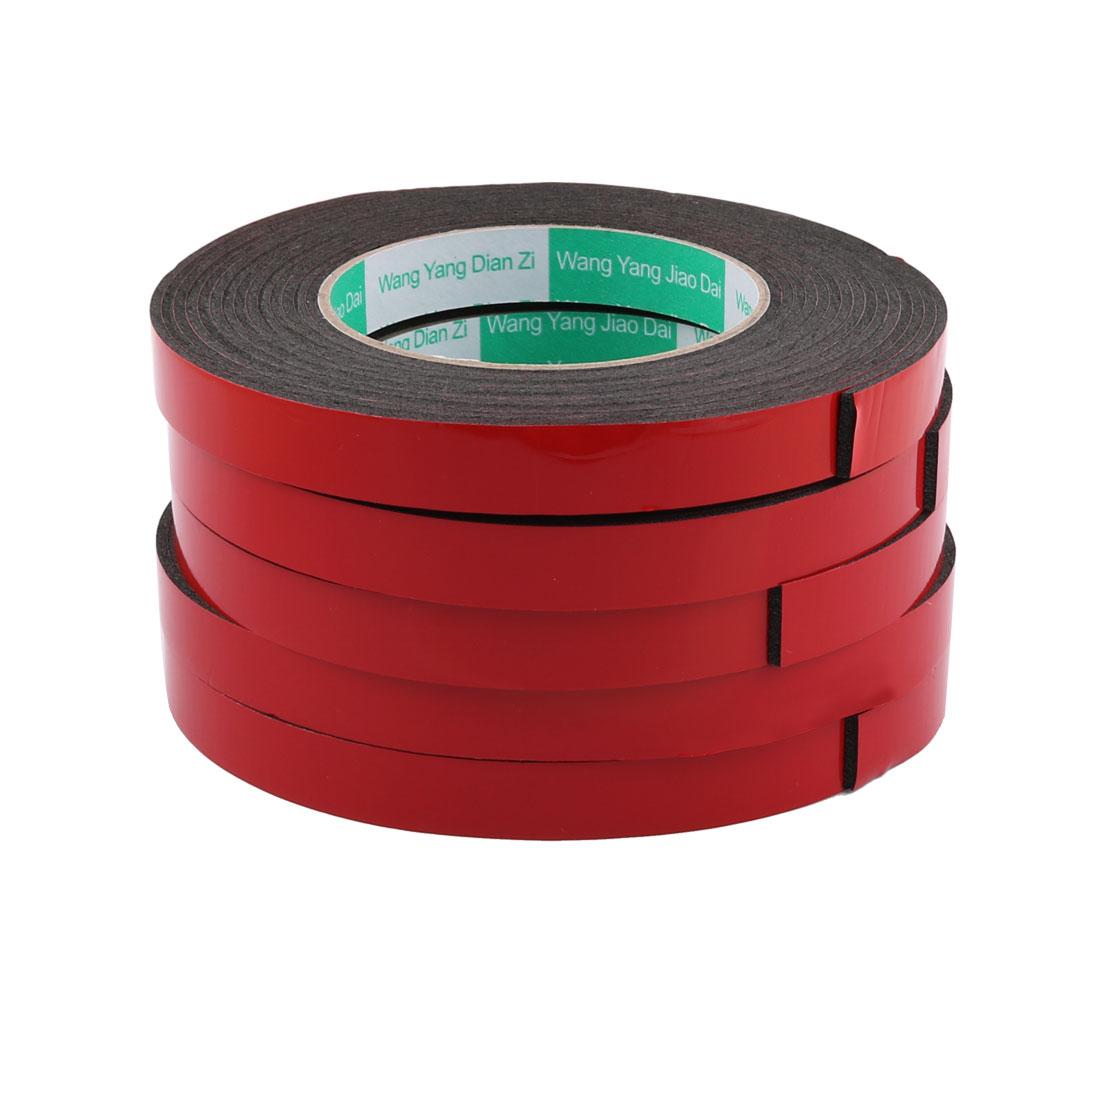 5Pcs 1.5CM Width 5M Length 2MM Thick Dual Sided Sealing Shockproof Sponge Tape